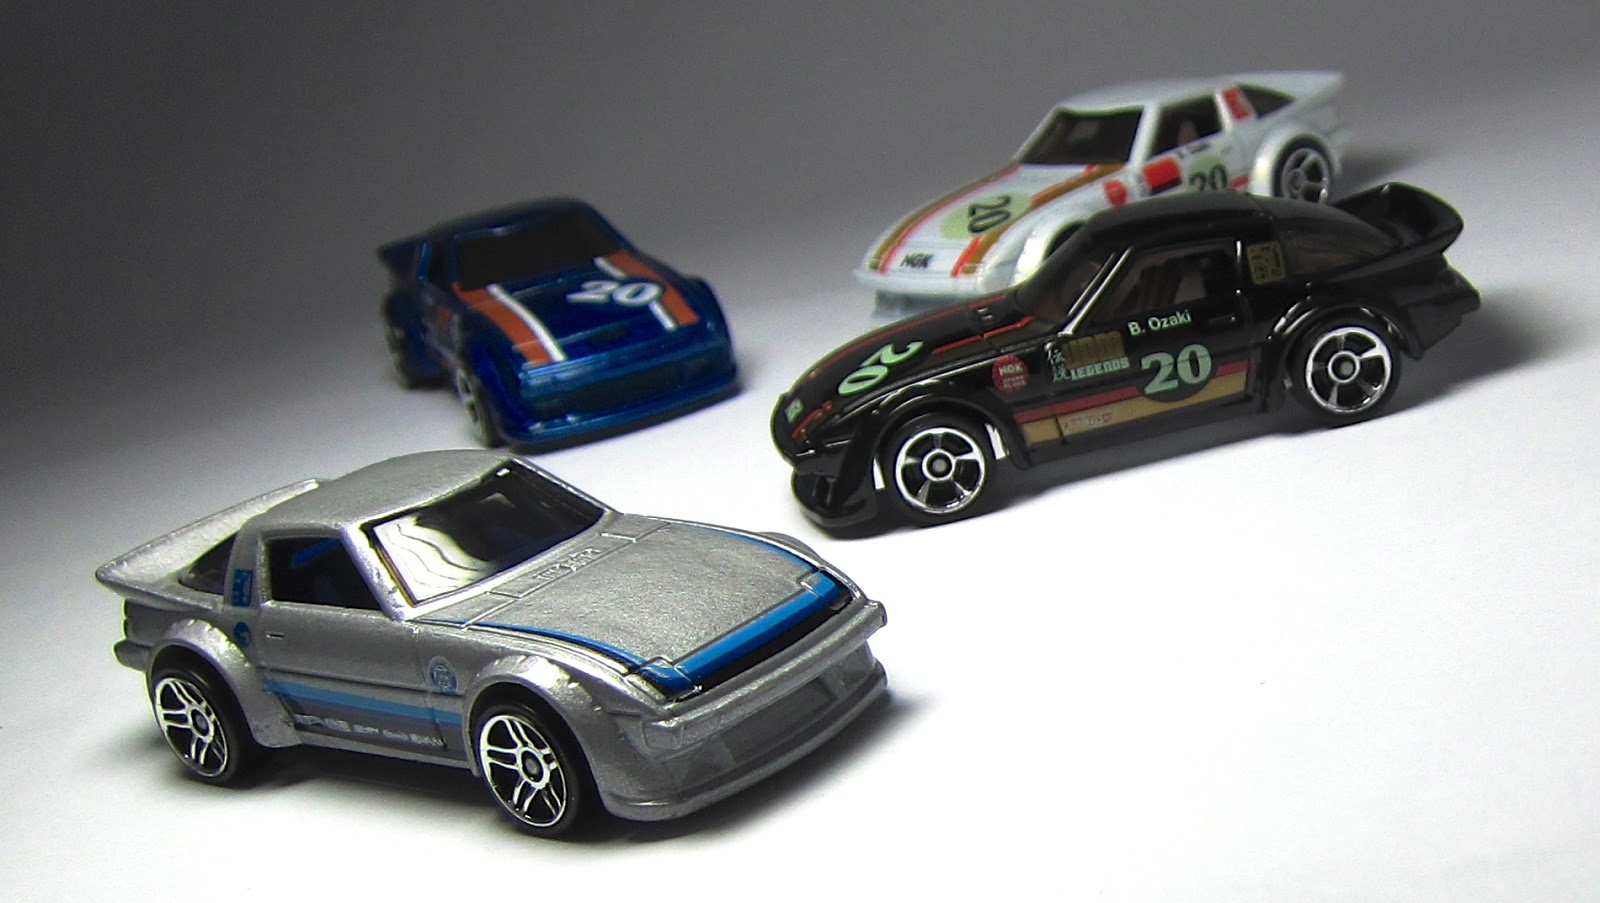 First Look: Hot Wheels Mazda RX-7 Treasure Hunt ...